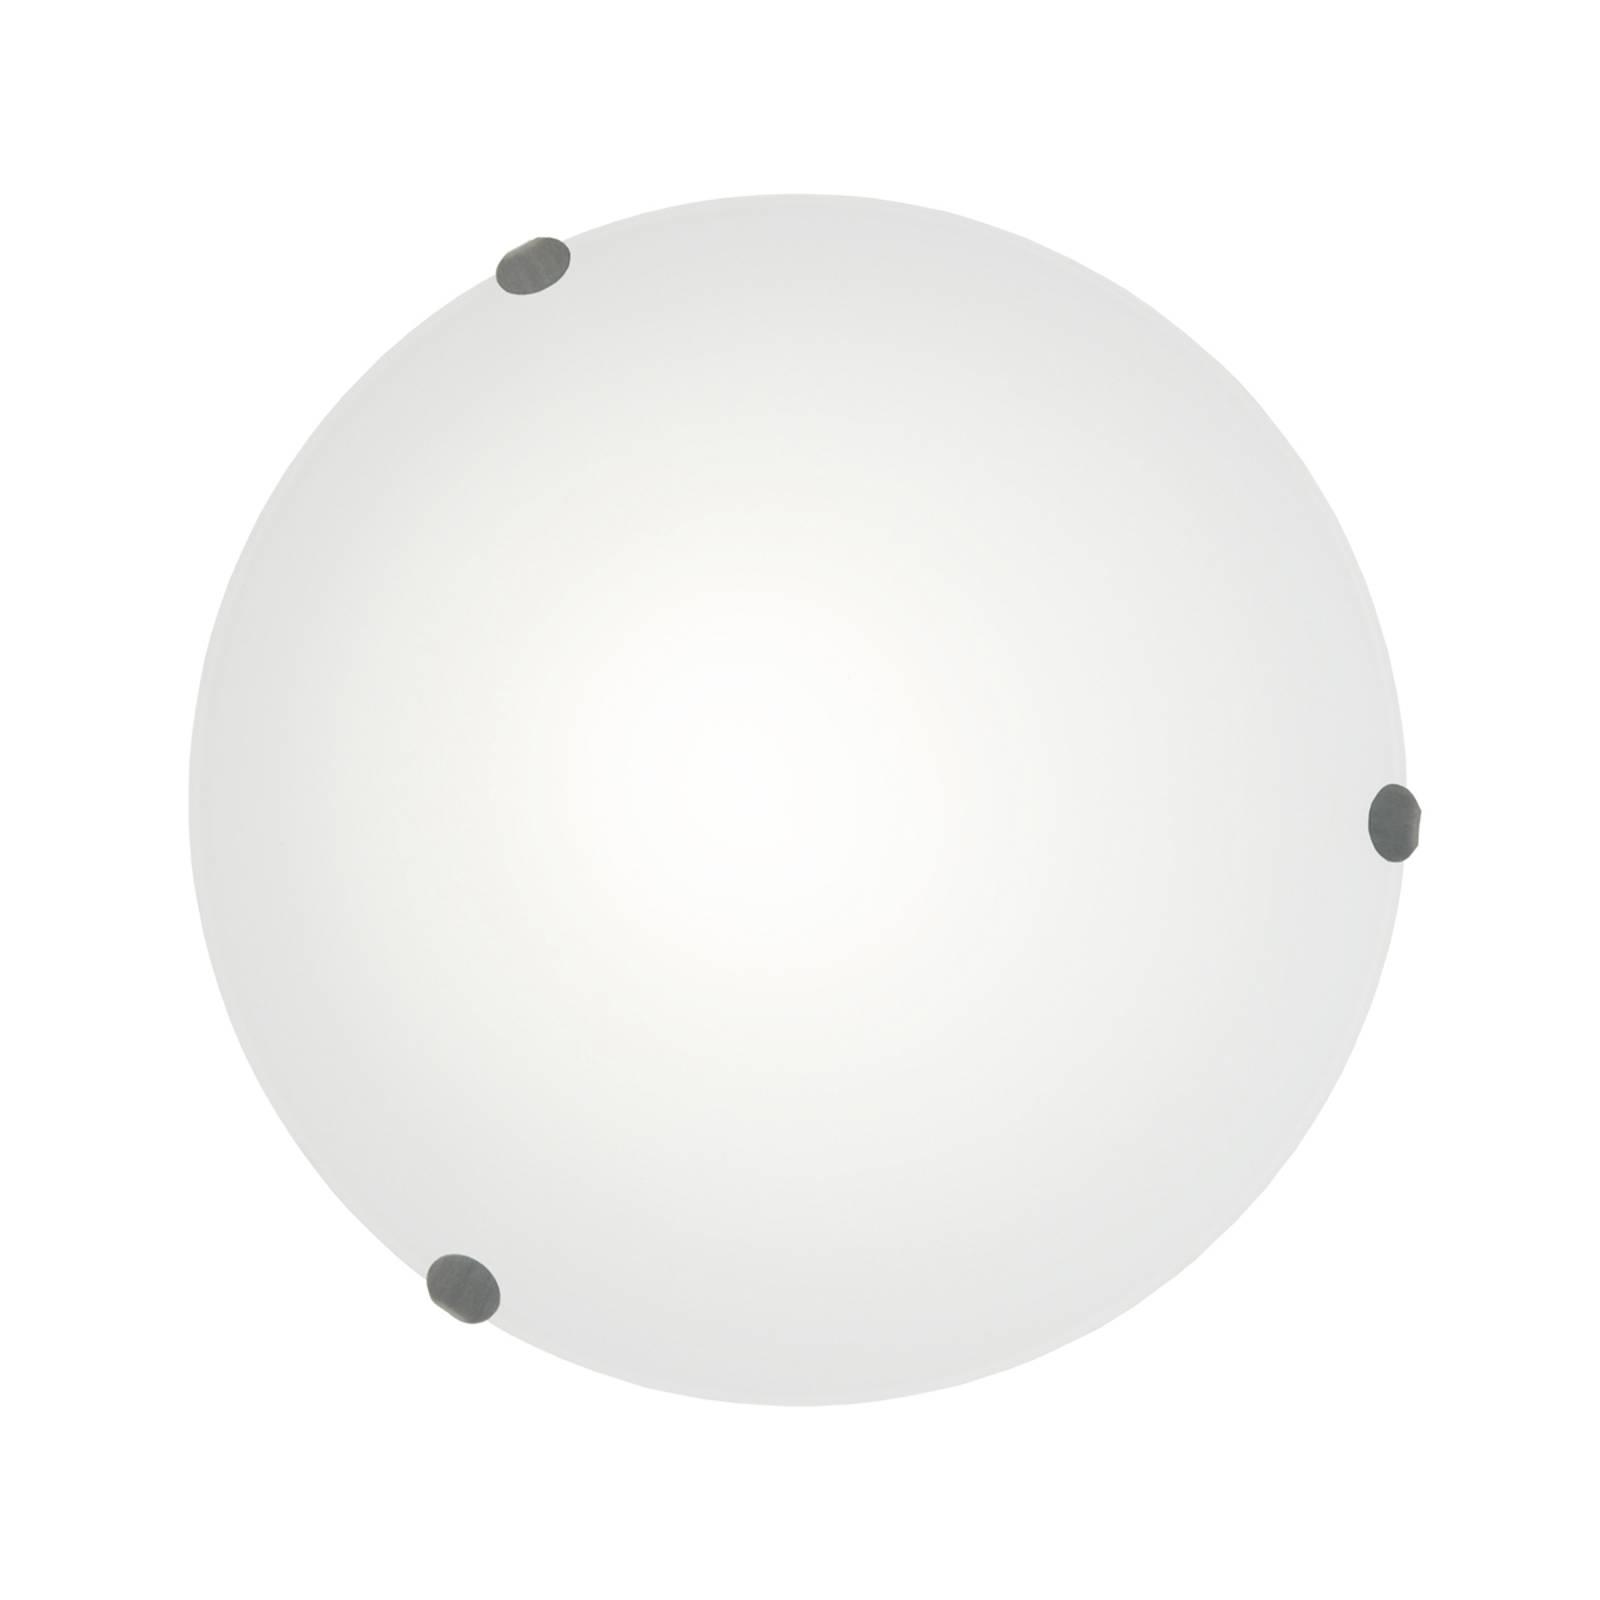 Ronde LED plafondlamp Ilaia - diameter 15 cm